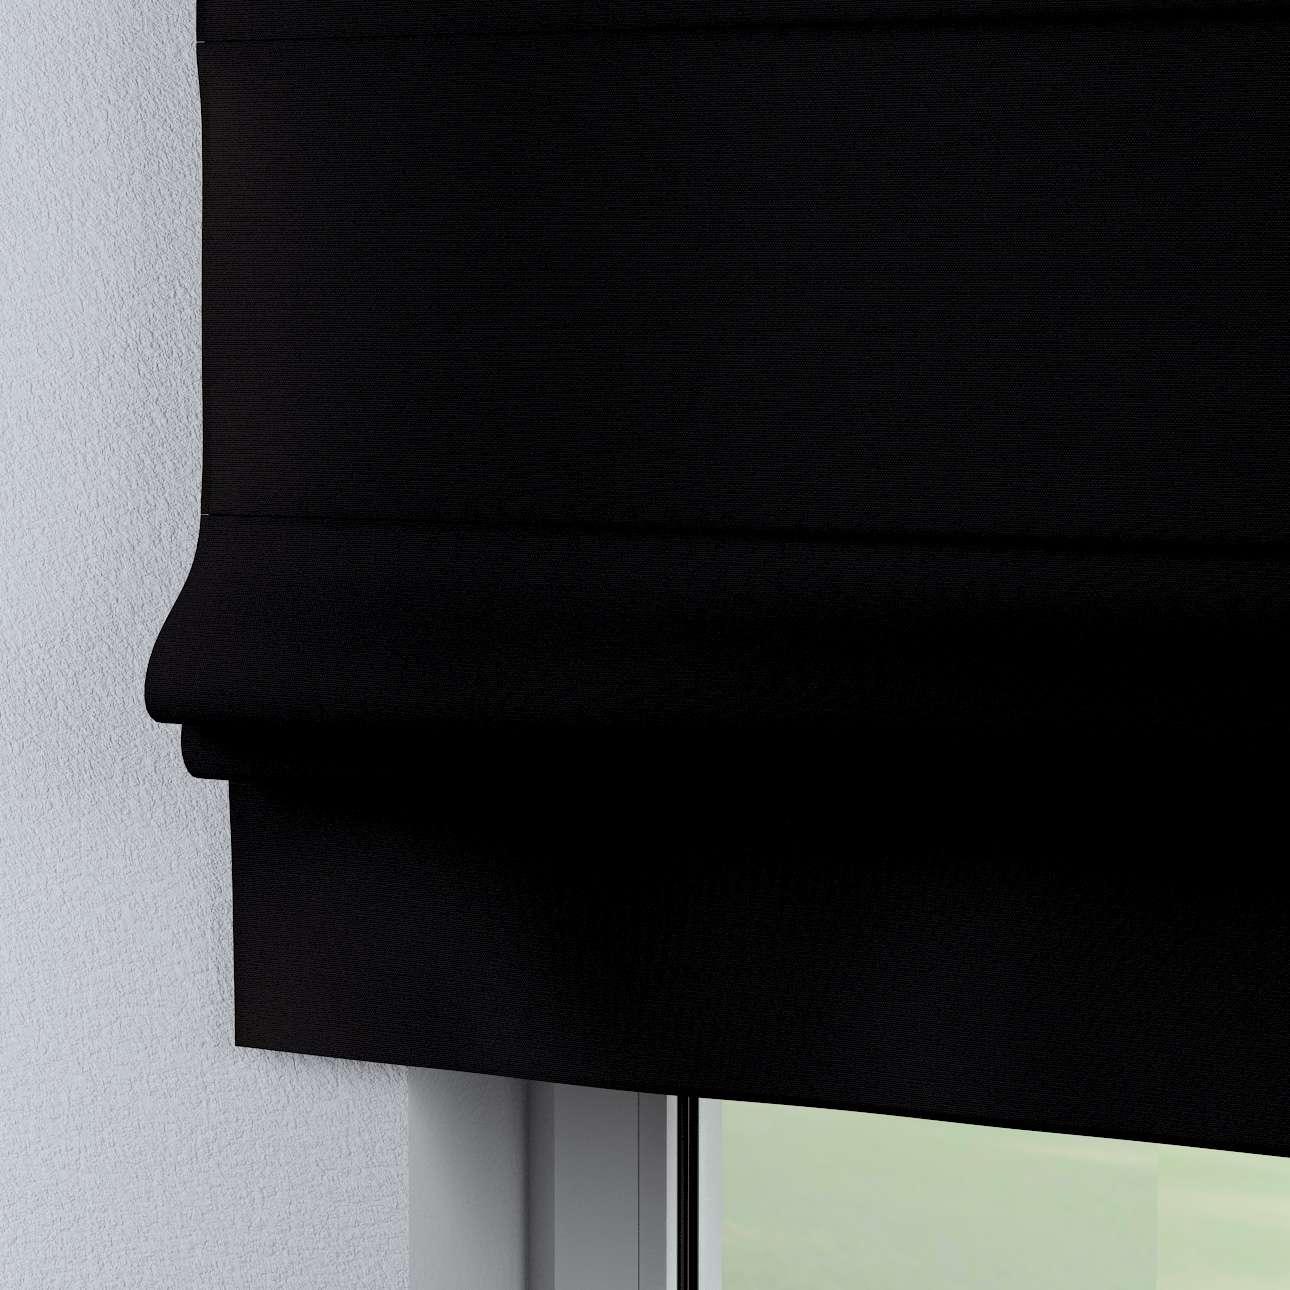 Rímska roleta Padva 80 x 170 cm V kolekcii Cotton Panama, tkanina: 702-09